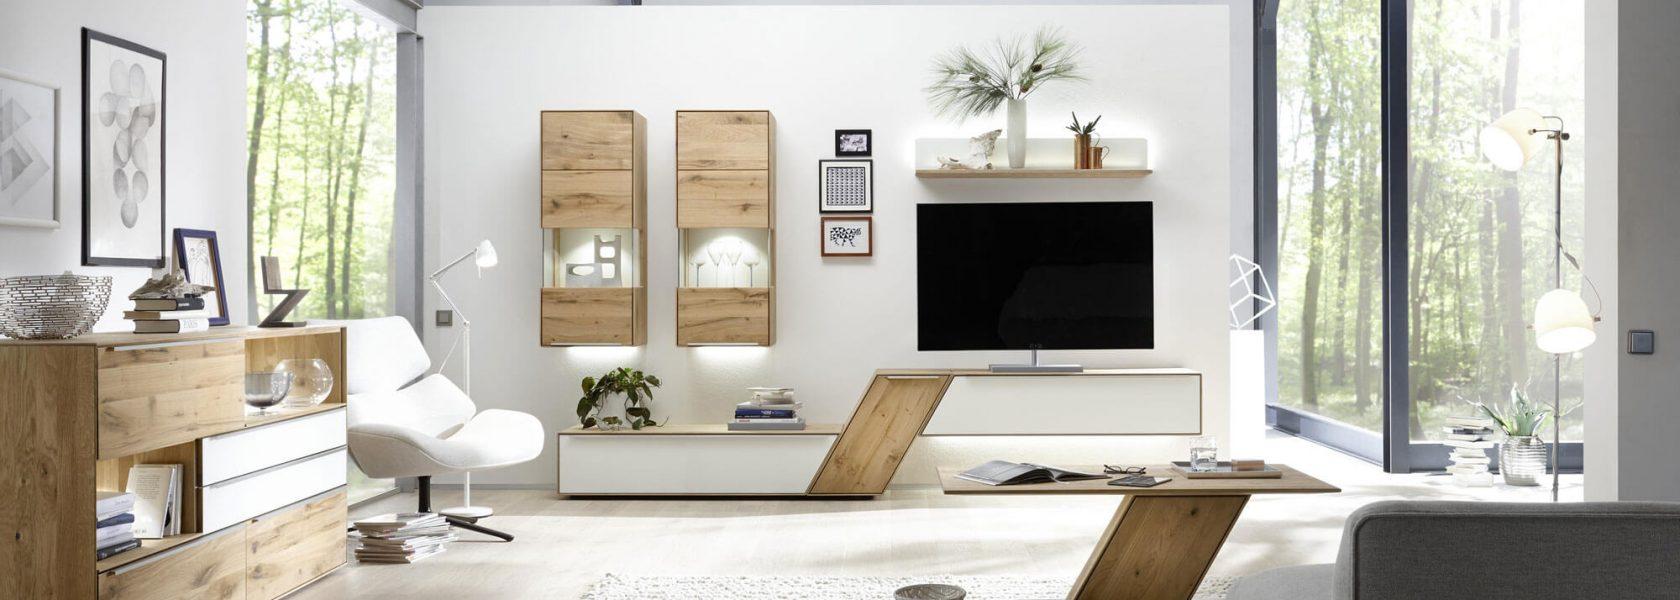 binzen magasin amazing vitra campus with binzen magasin gallery of meuble elegant magasin. Black Bedroom Furniture Sets. Home Design Ideas